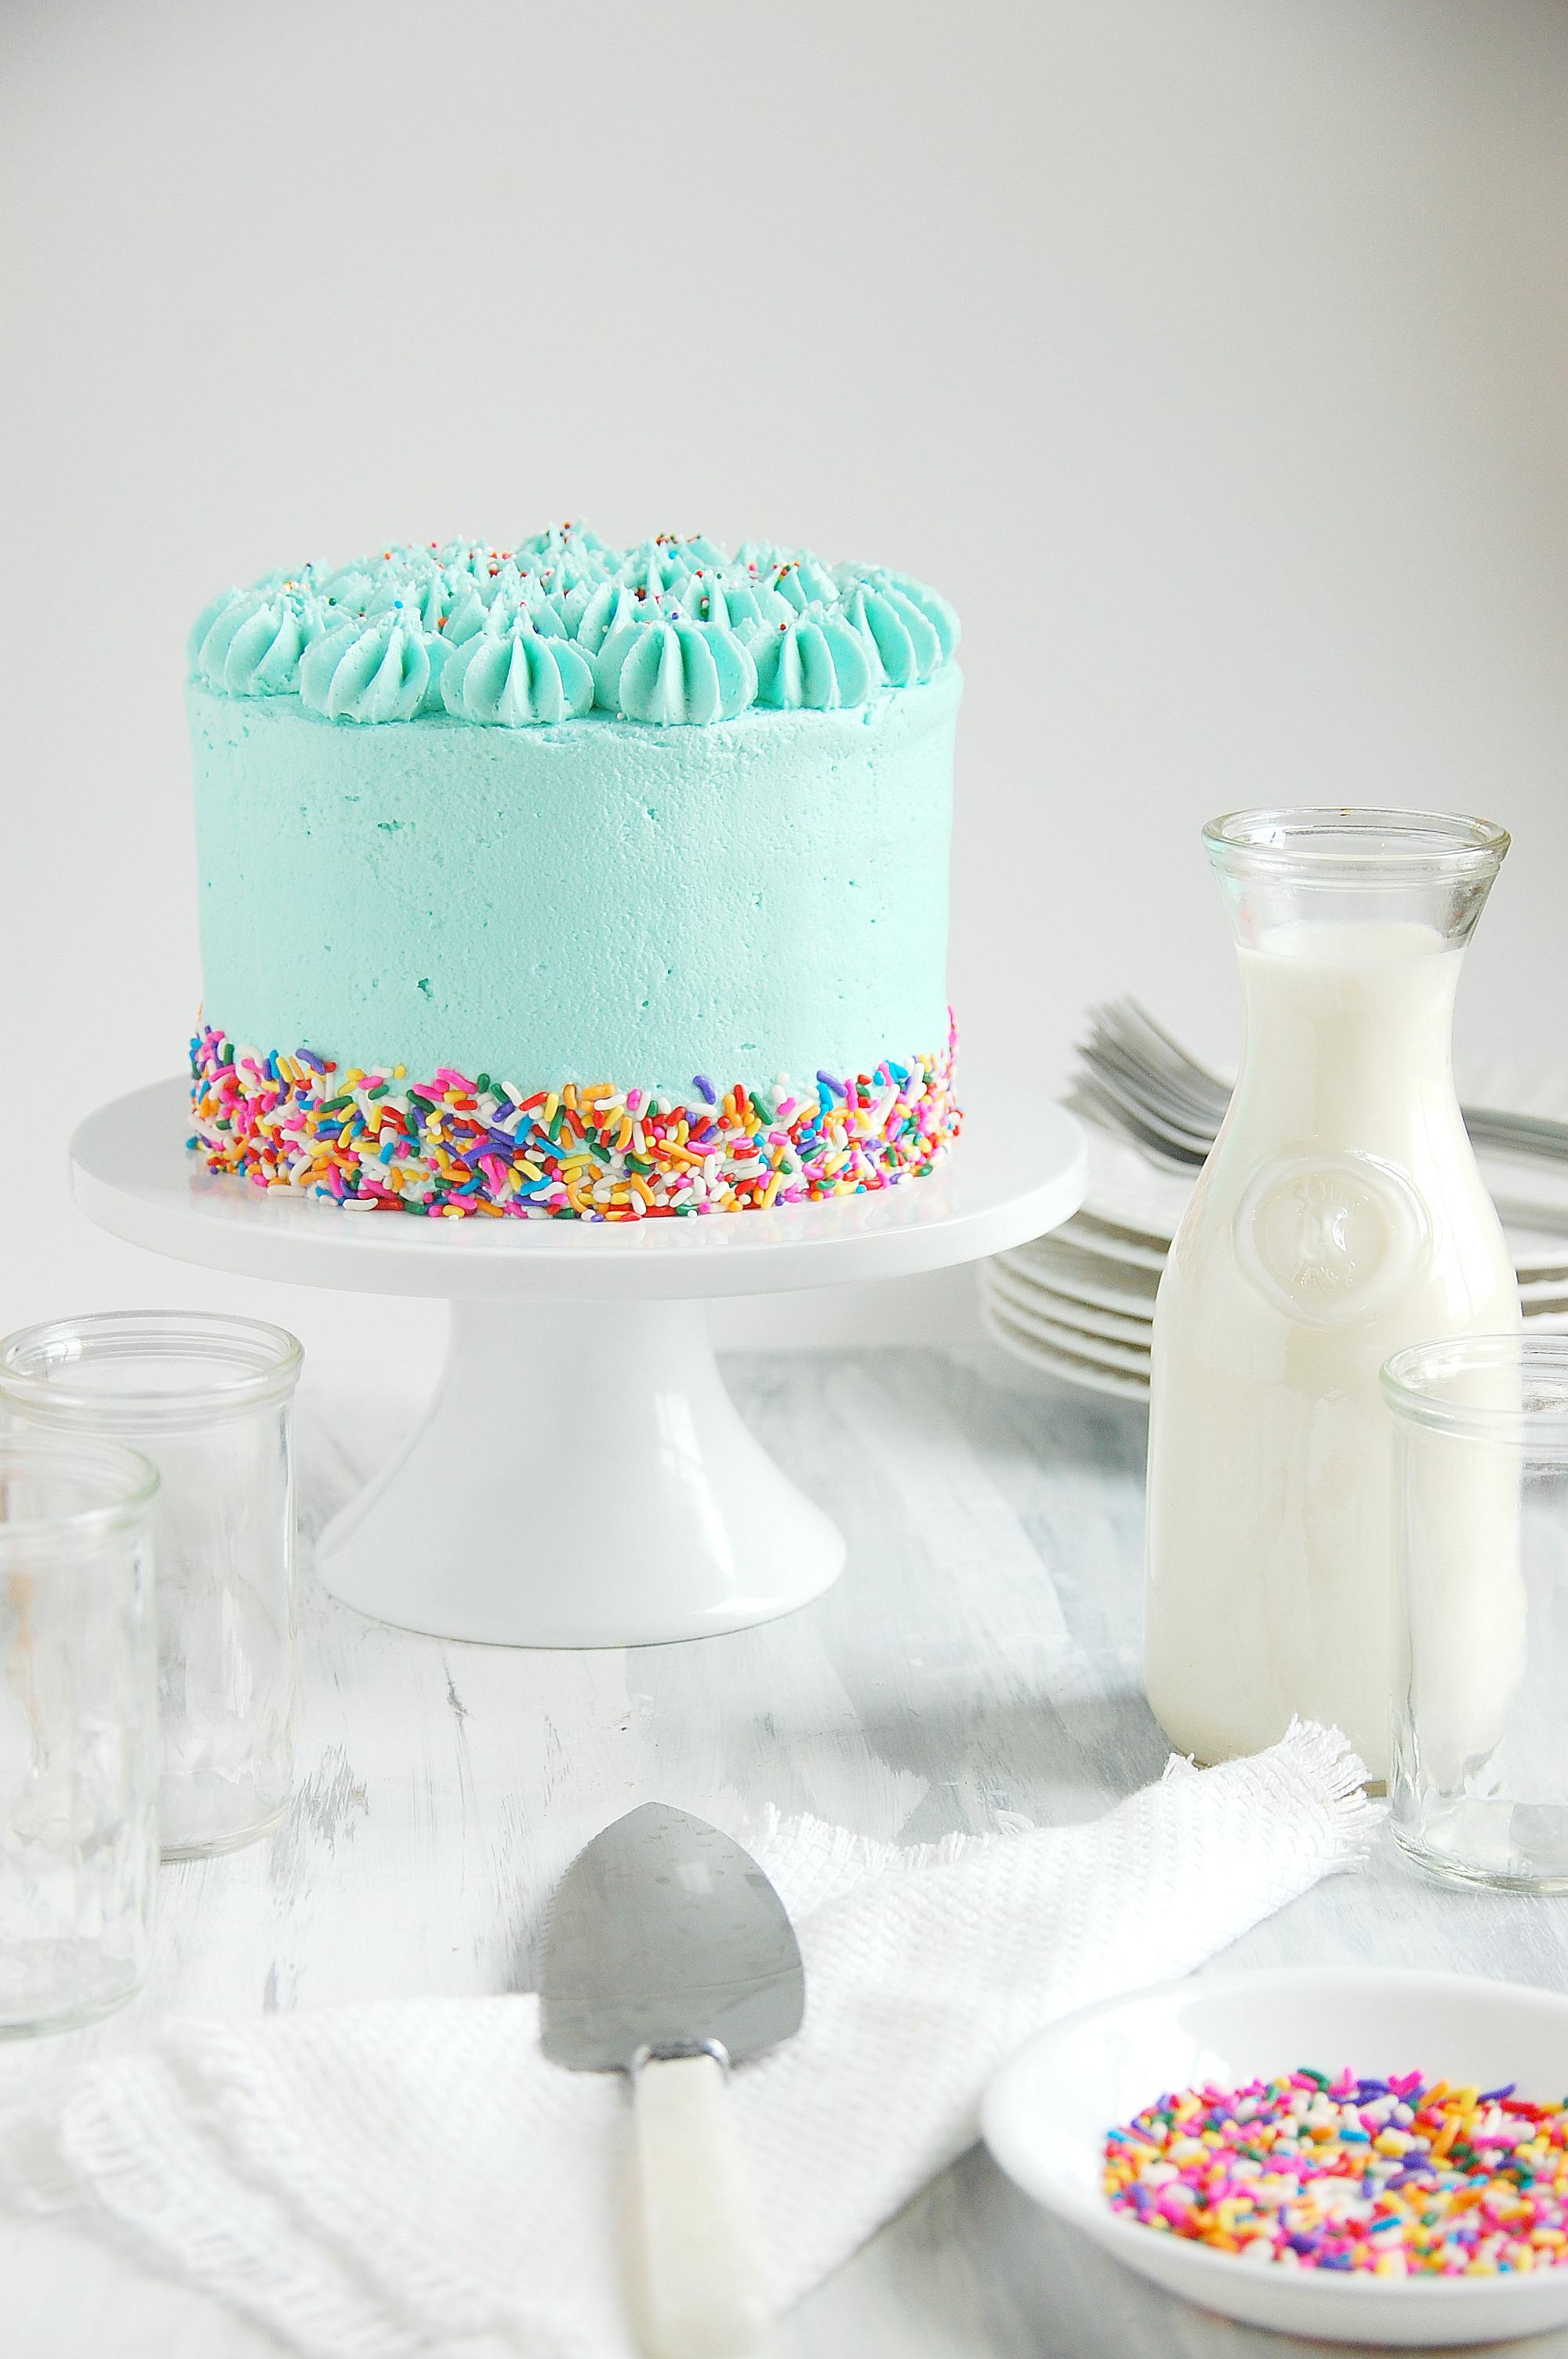 Pleasing Funfetti Birthday Cake Gluten And Dairy Free 3 The Kitchen Mccabe Personalised Birthday Cards Paralily Jamesorg